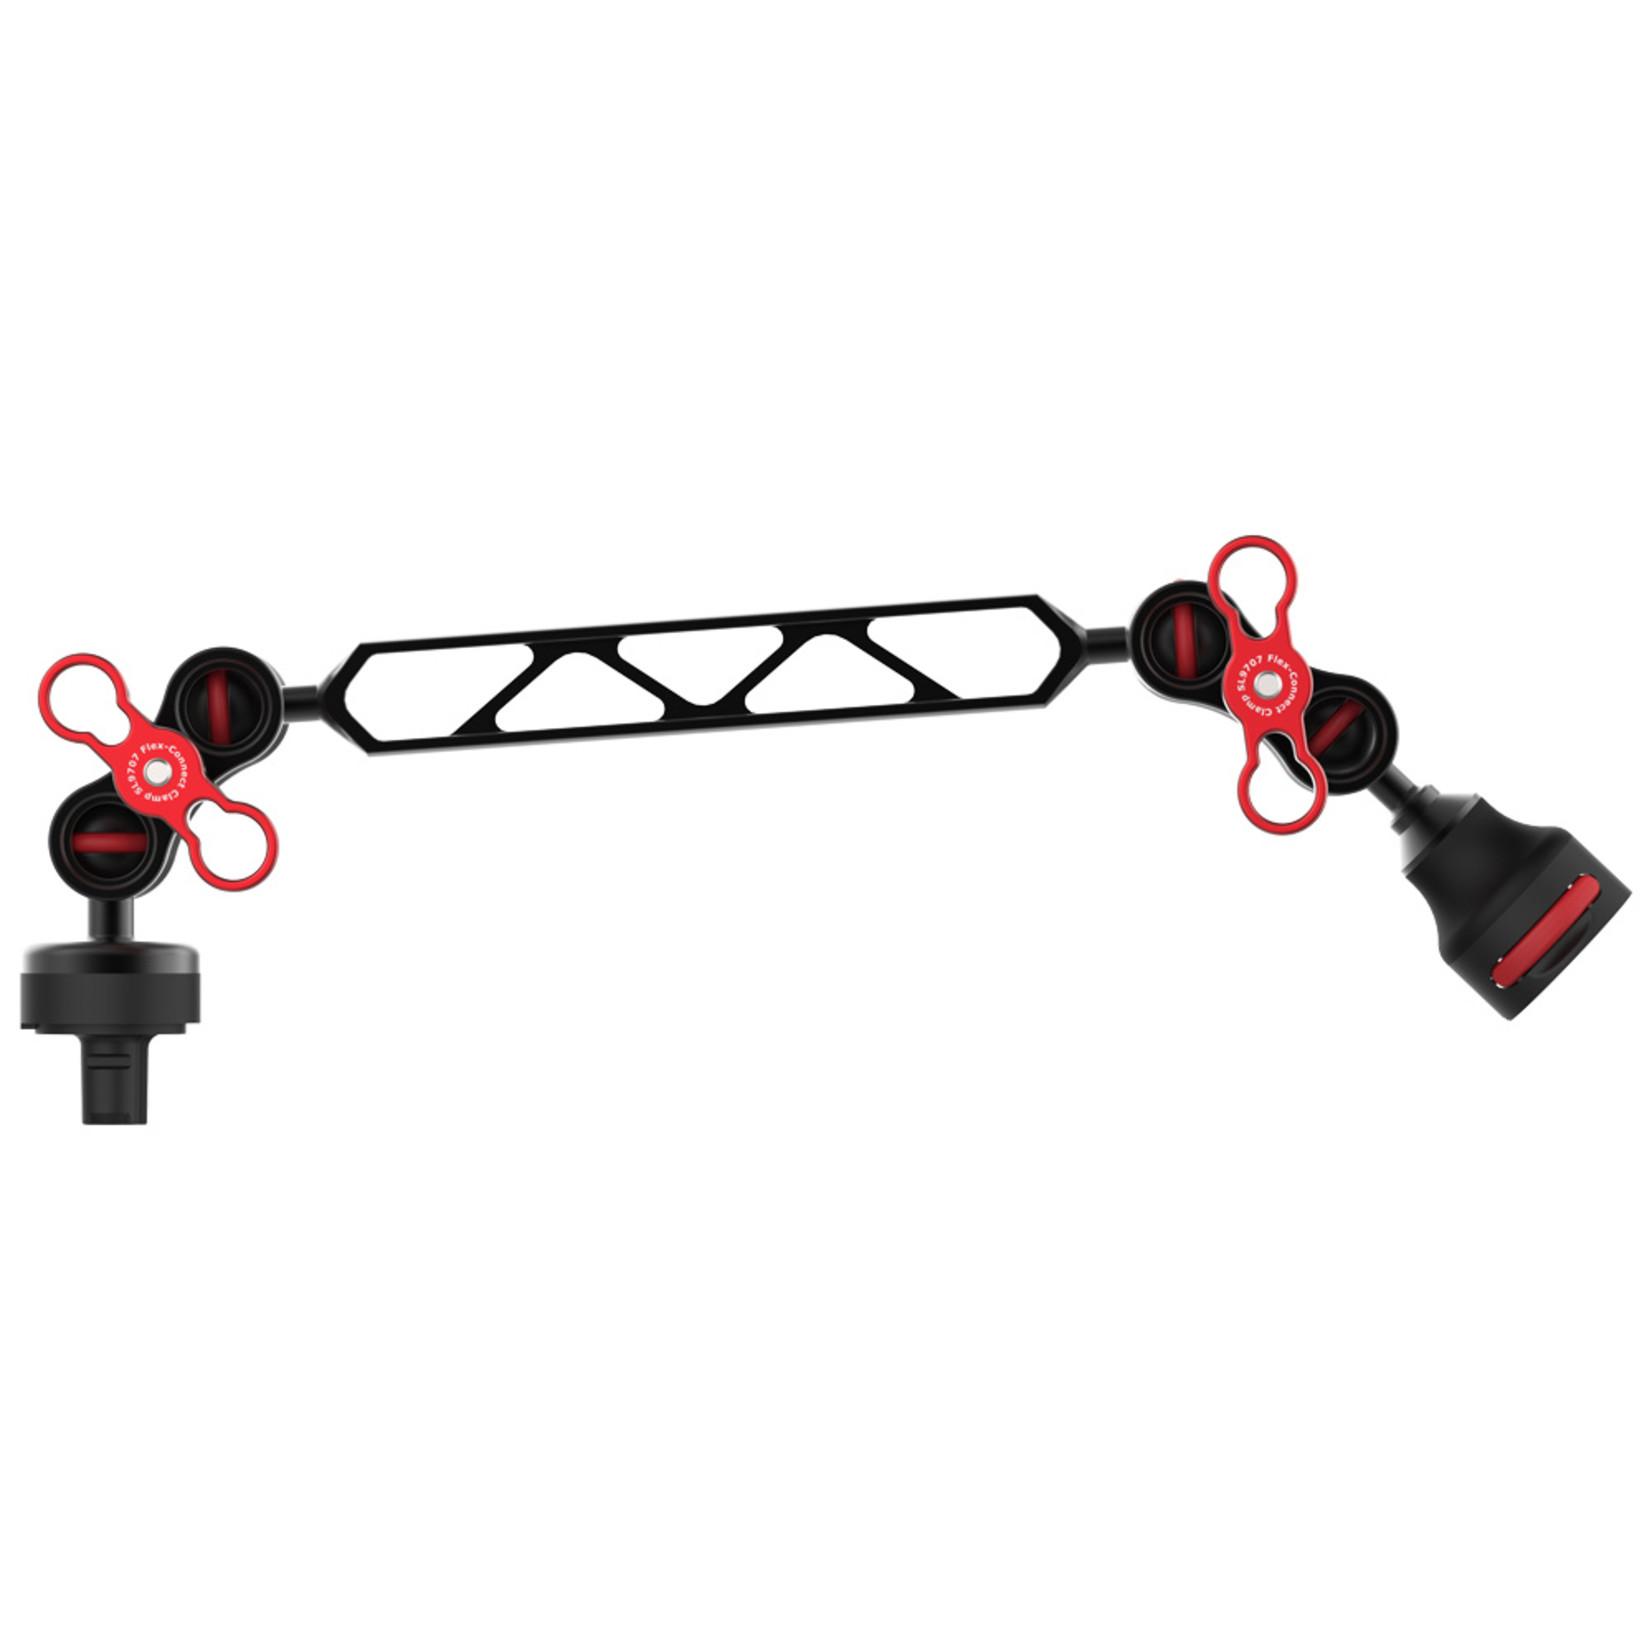 Sealife (KIT 11) Flex Connect Ball Arm Kit with SL995/SL999/SL9909/2xSL9907)